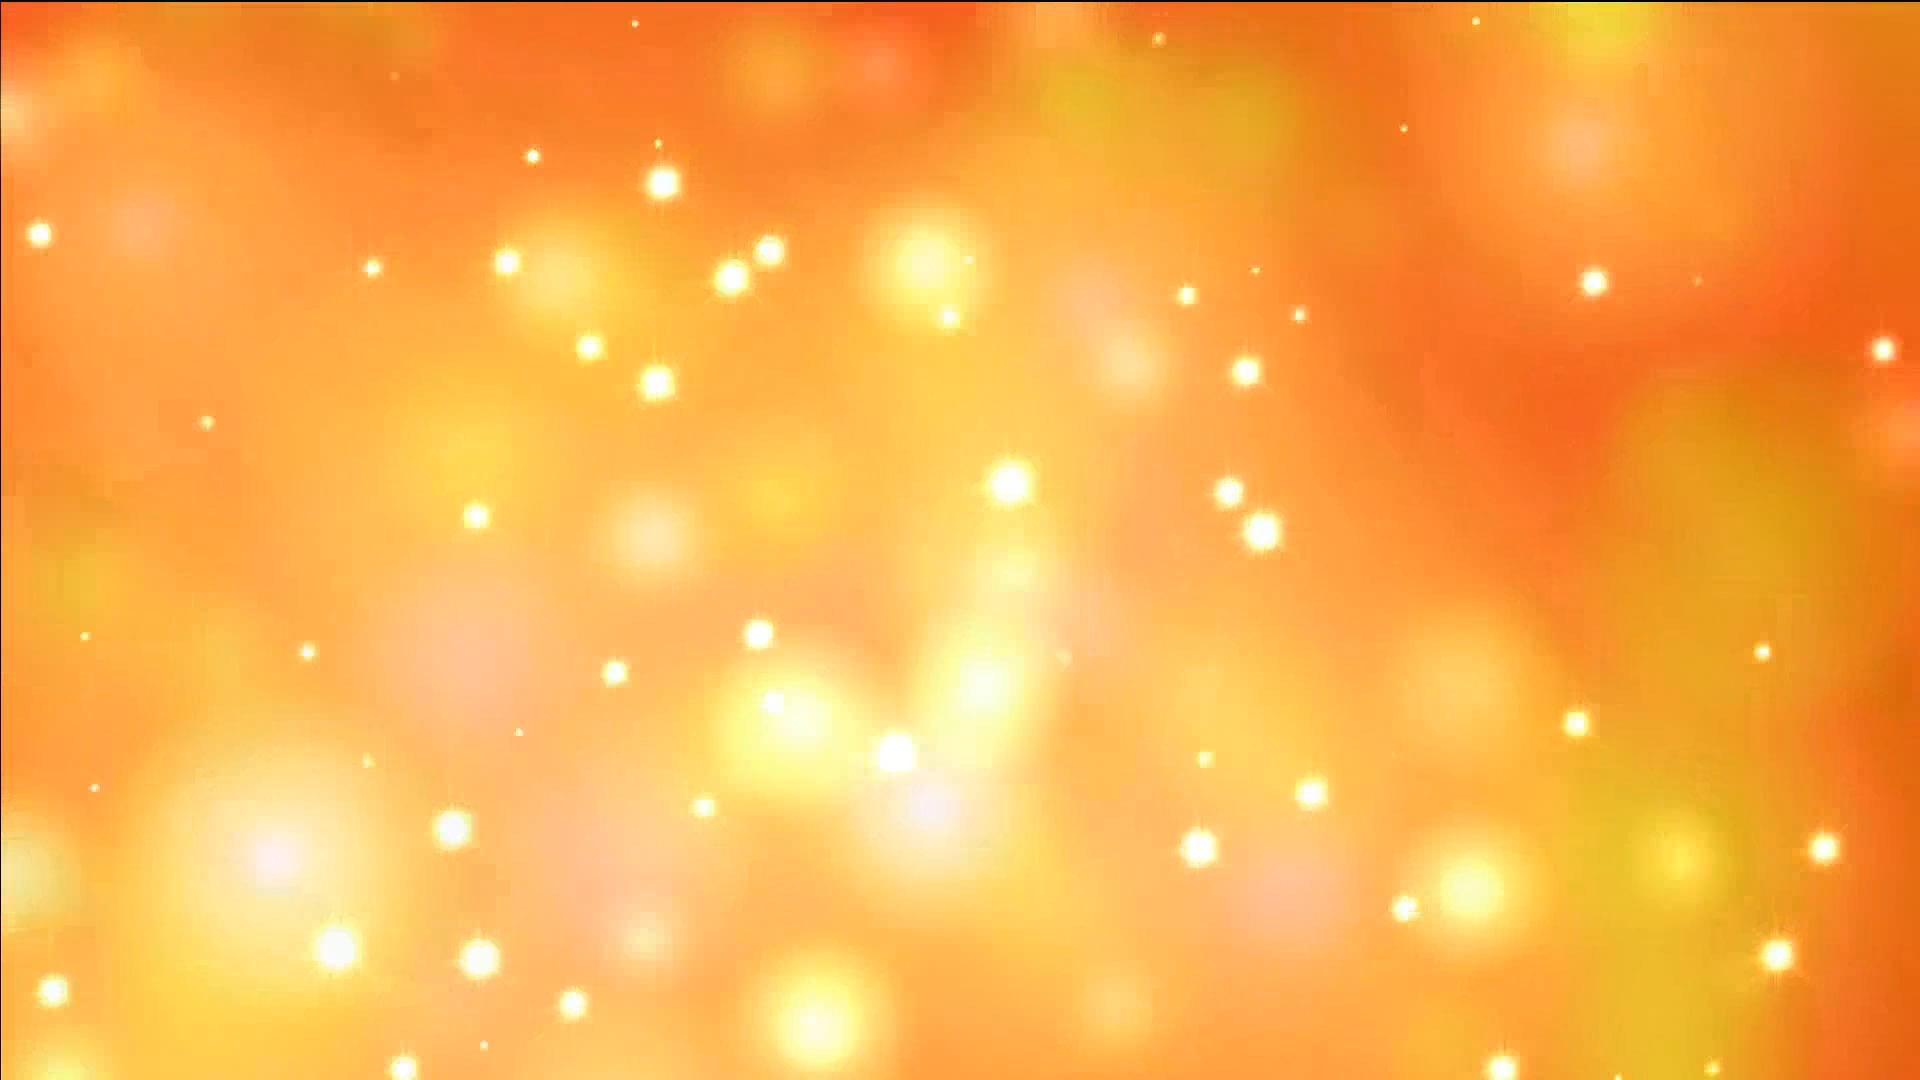 Gemini Observatory: Exploring The Universe From Both Hemispheres